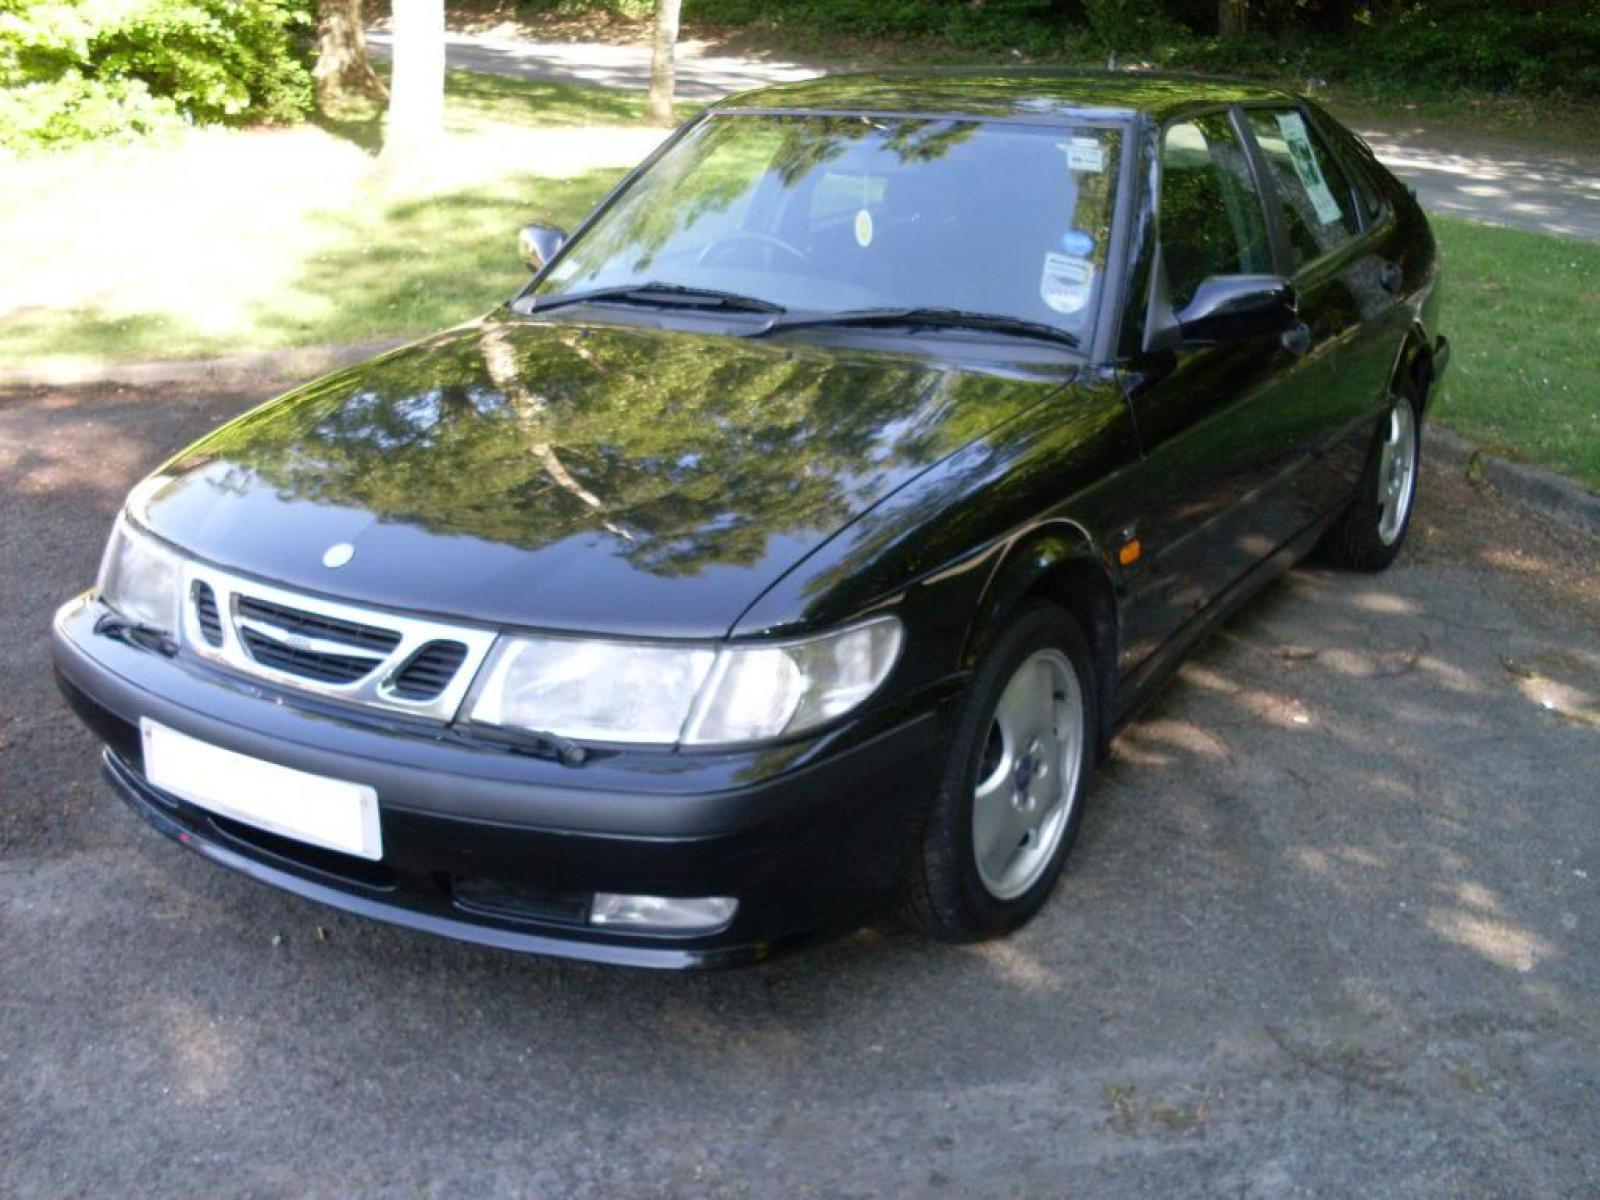 800 1024 1280 1600 Origin 1999 Saab 9 3